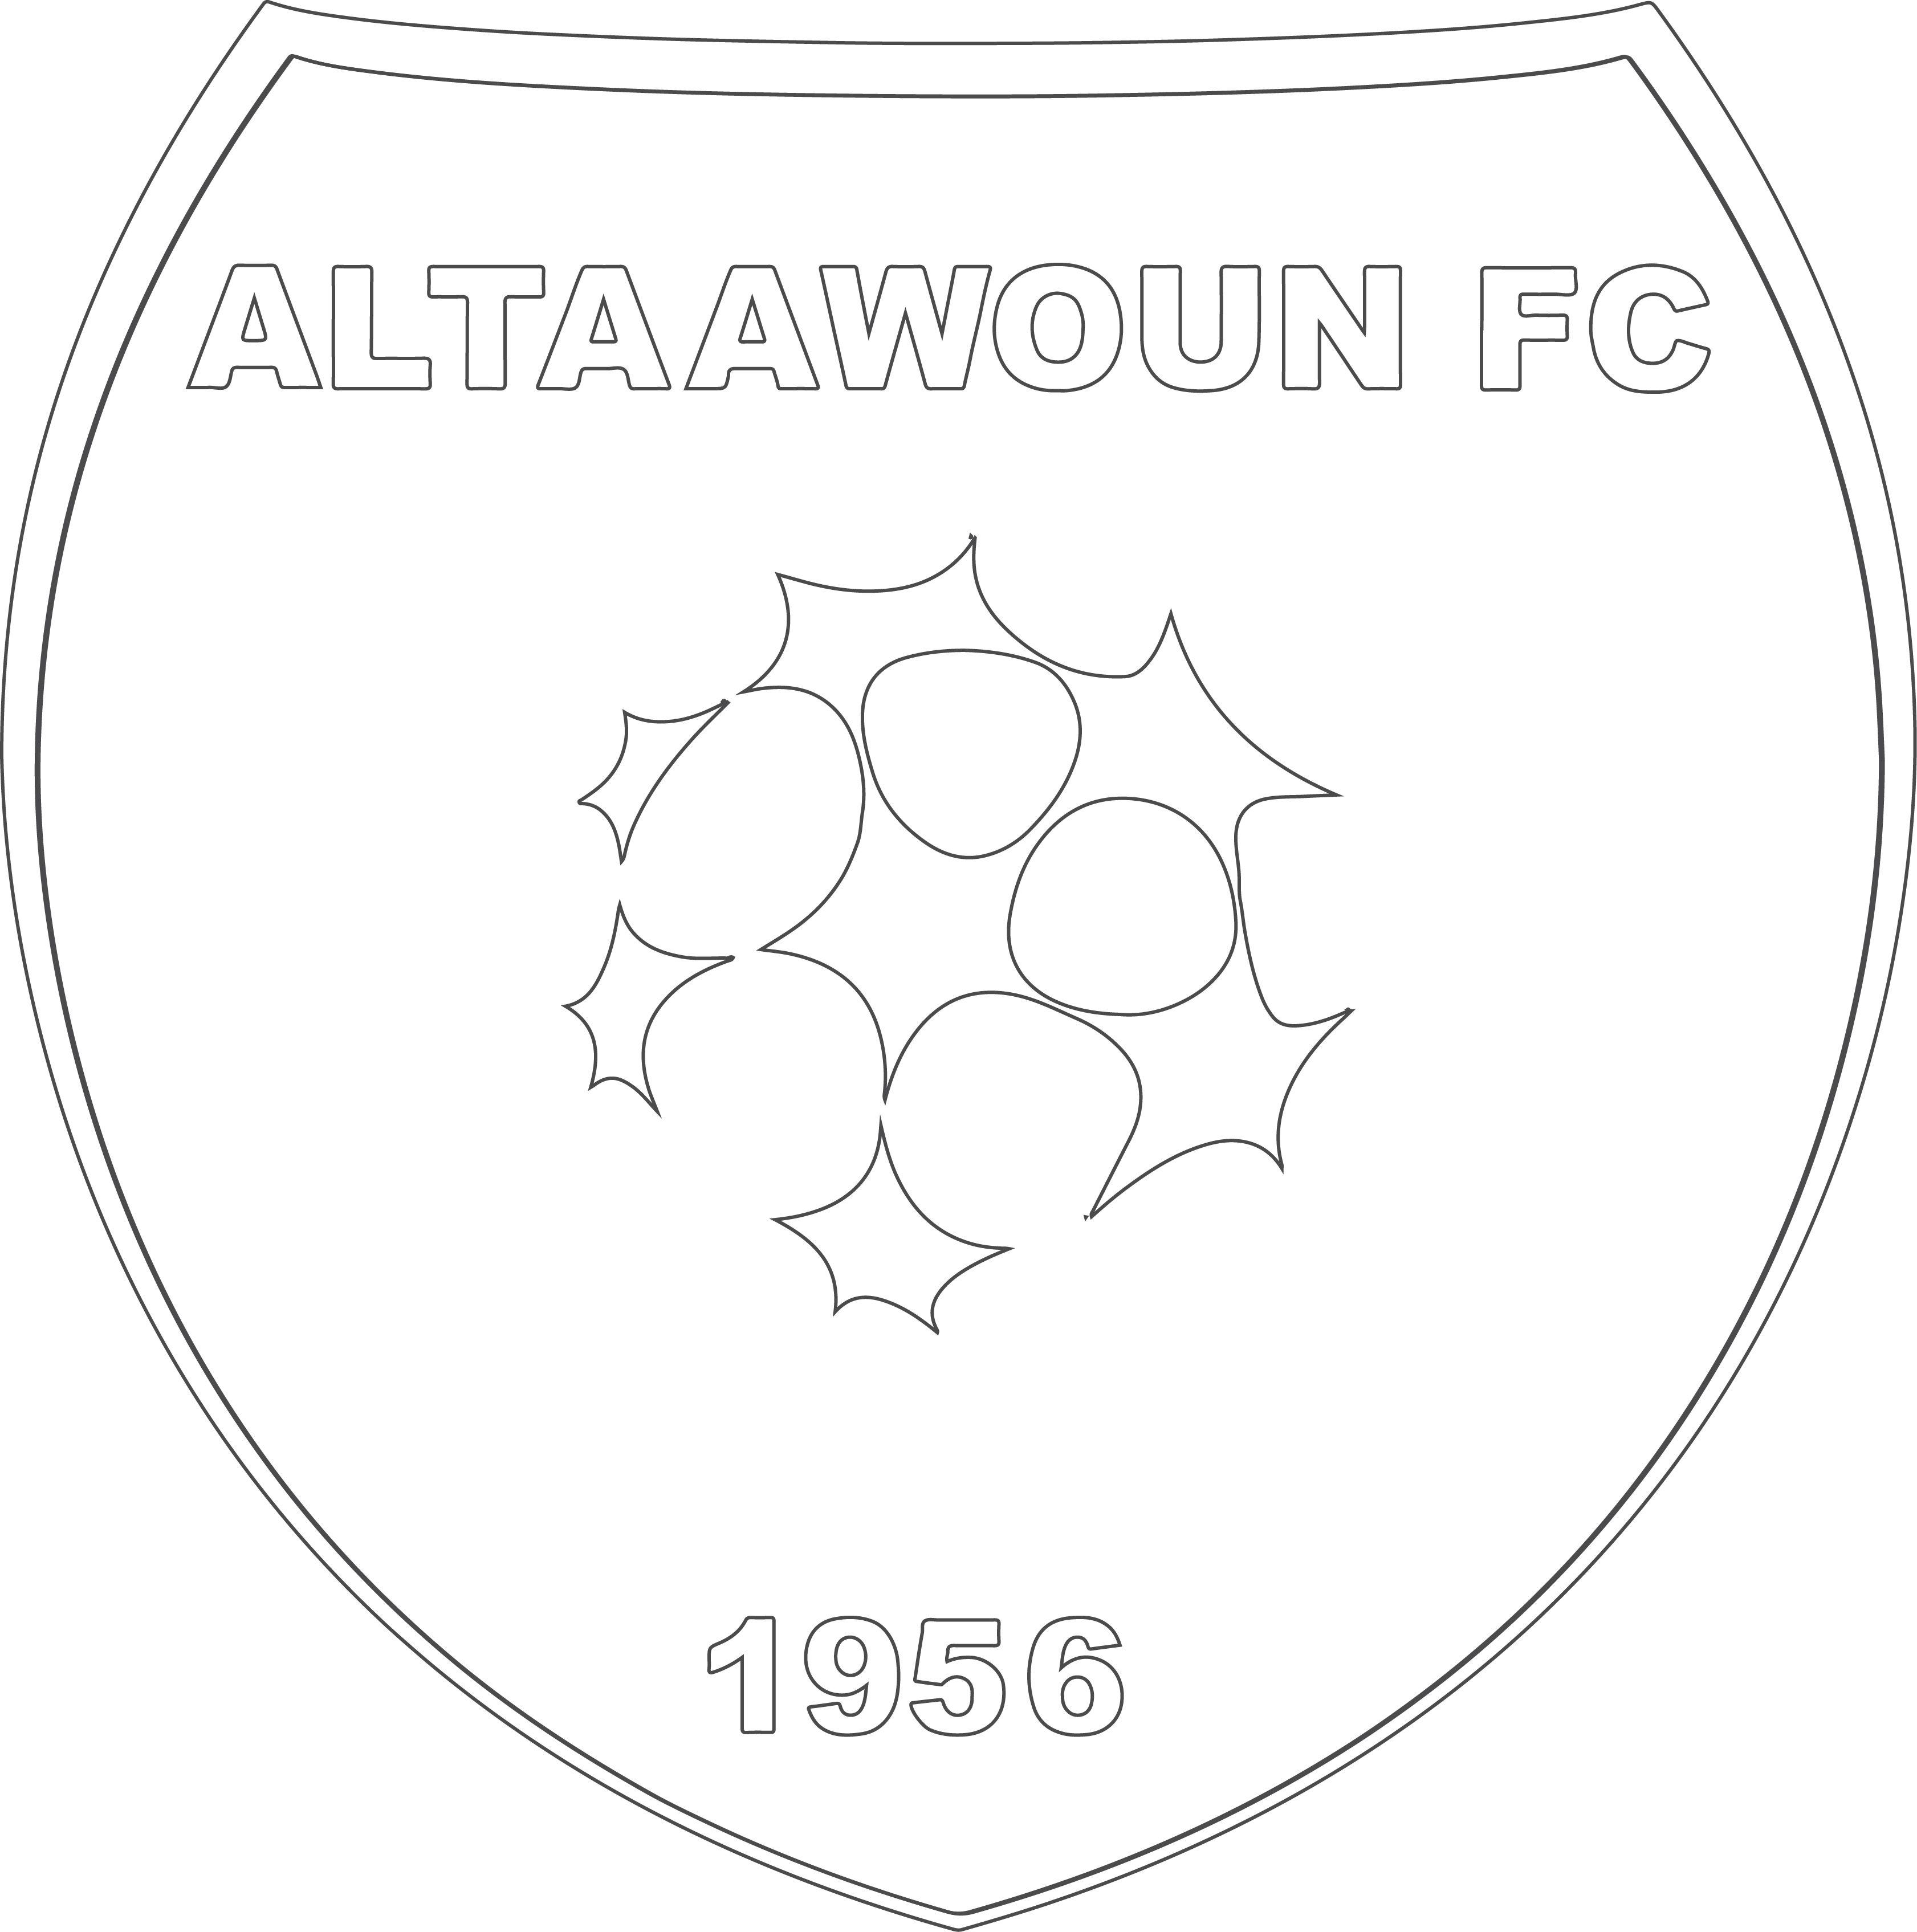 Pin By Wassappy On Y Ac Milan Kit Football Club Ac Milan